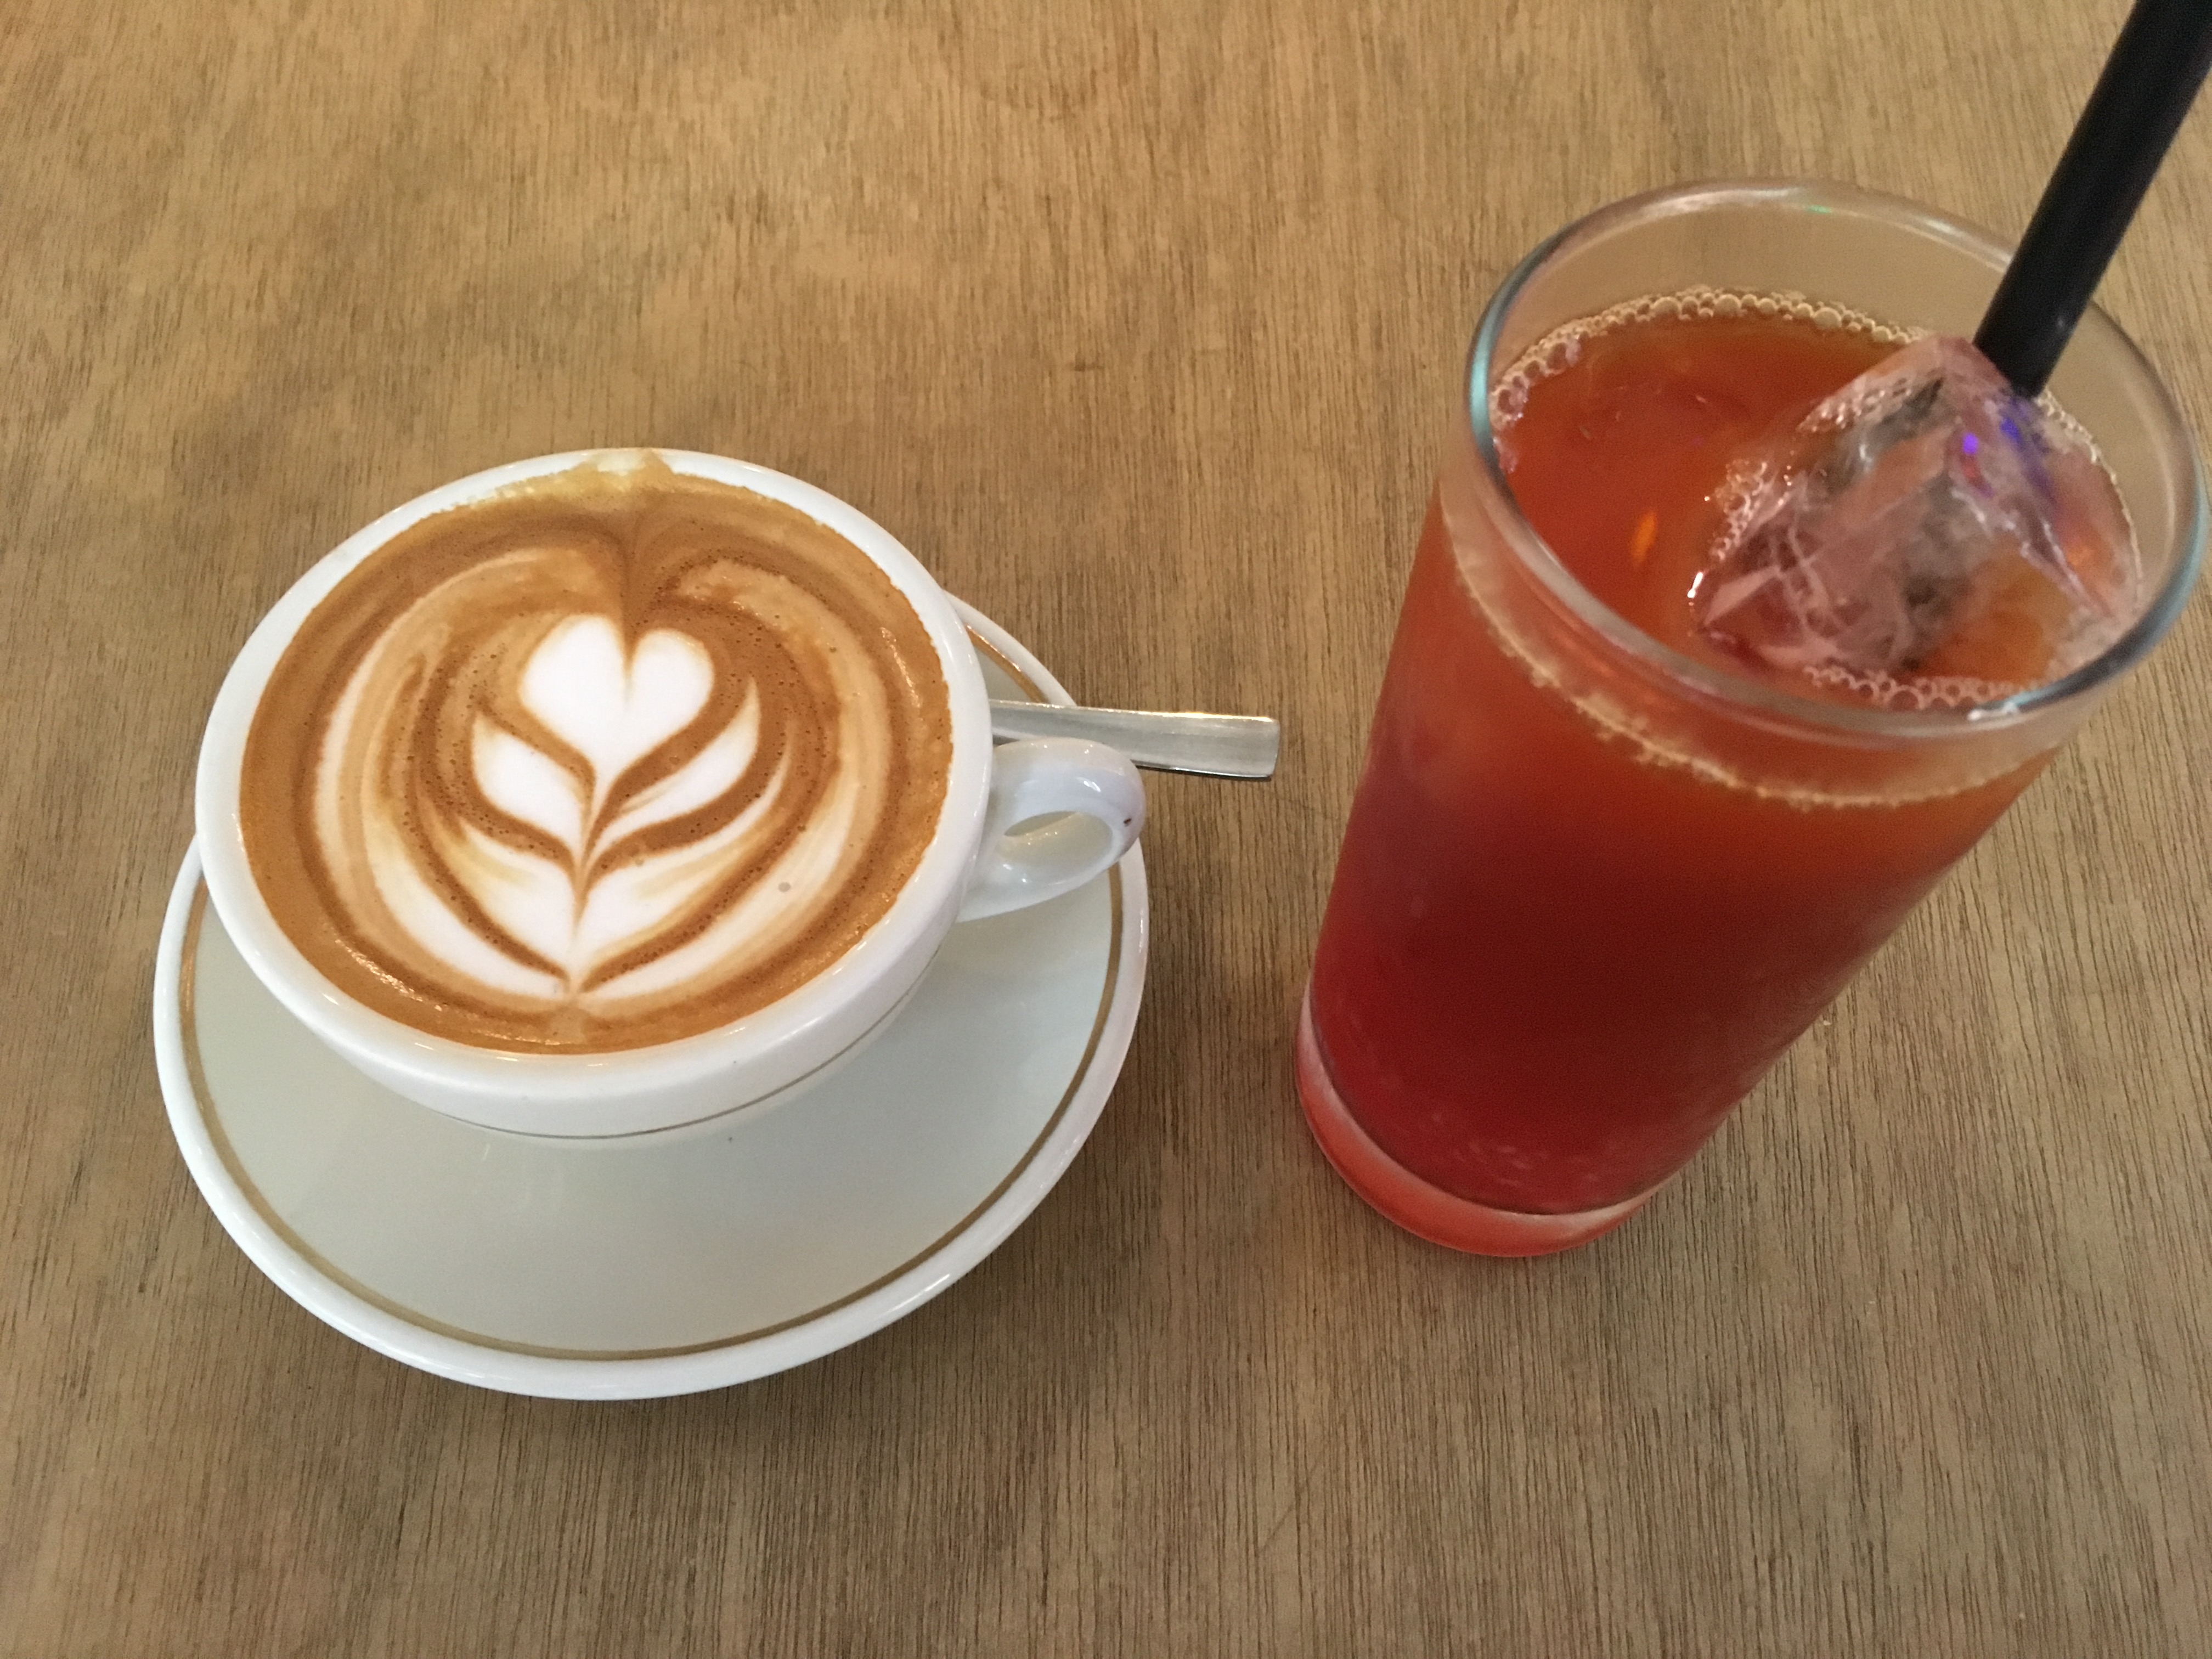 The Bravery Café - Flat White and Iced Raspberry Tea